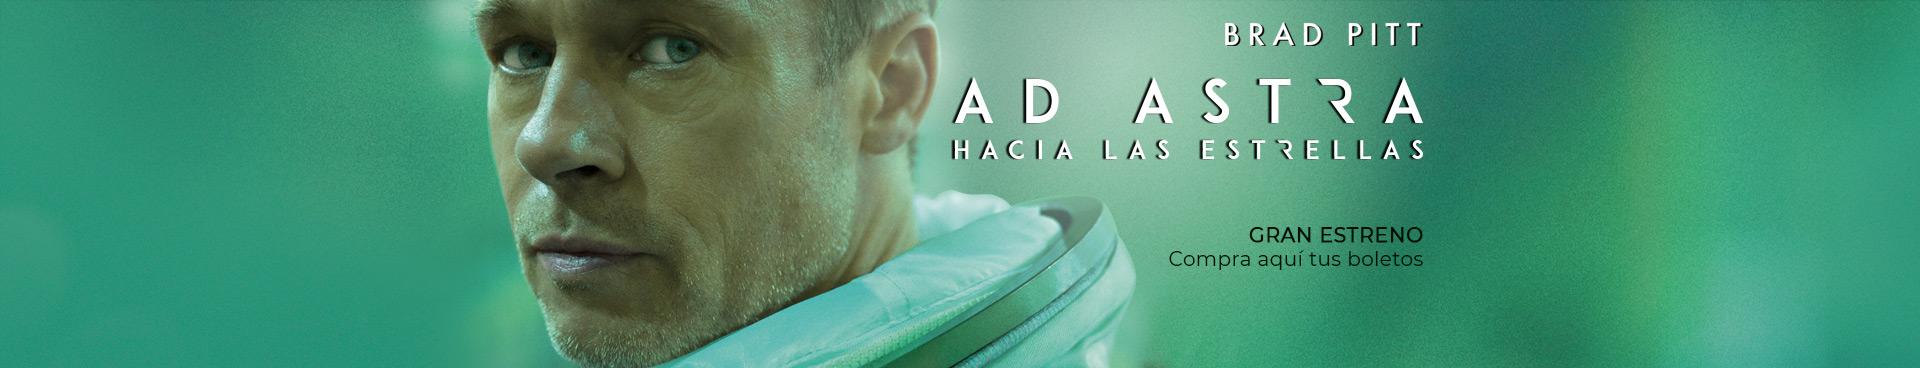 Gran estreno: Ad Astra